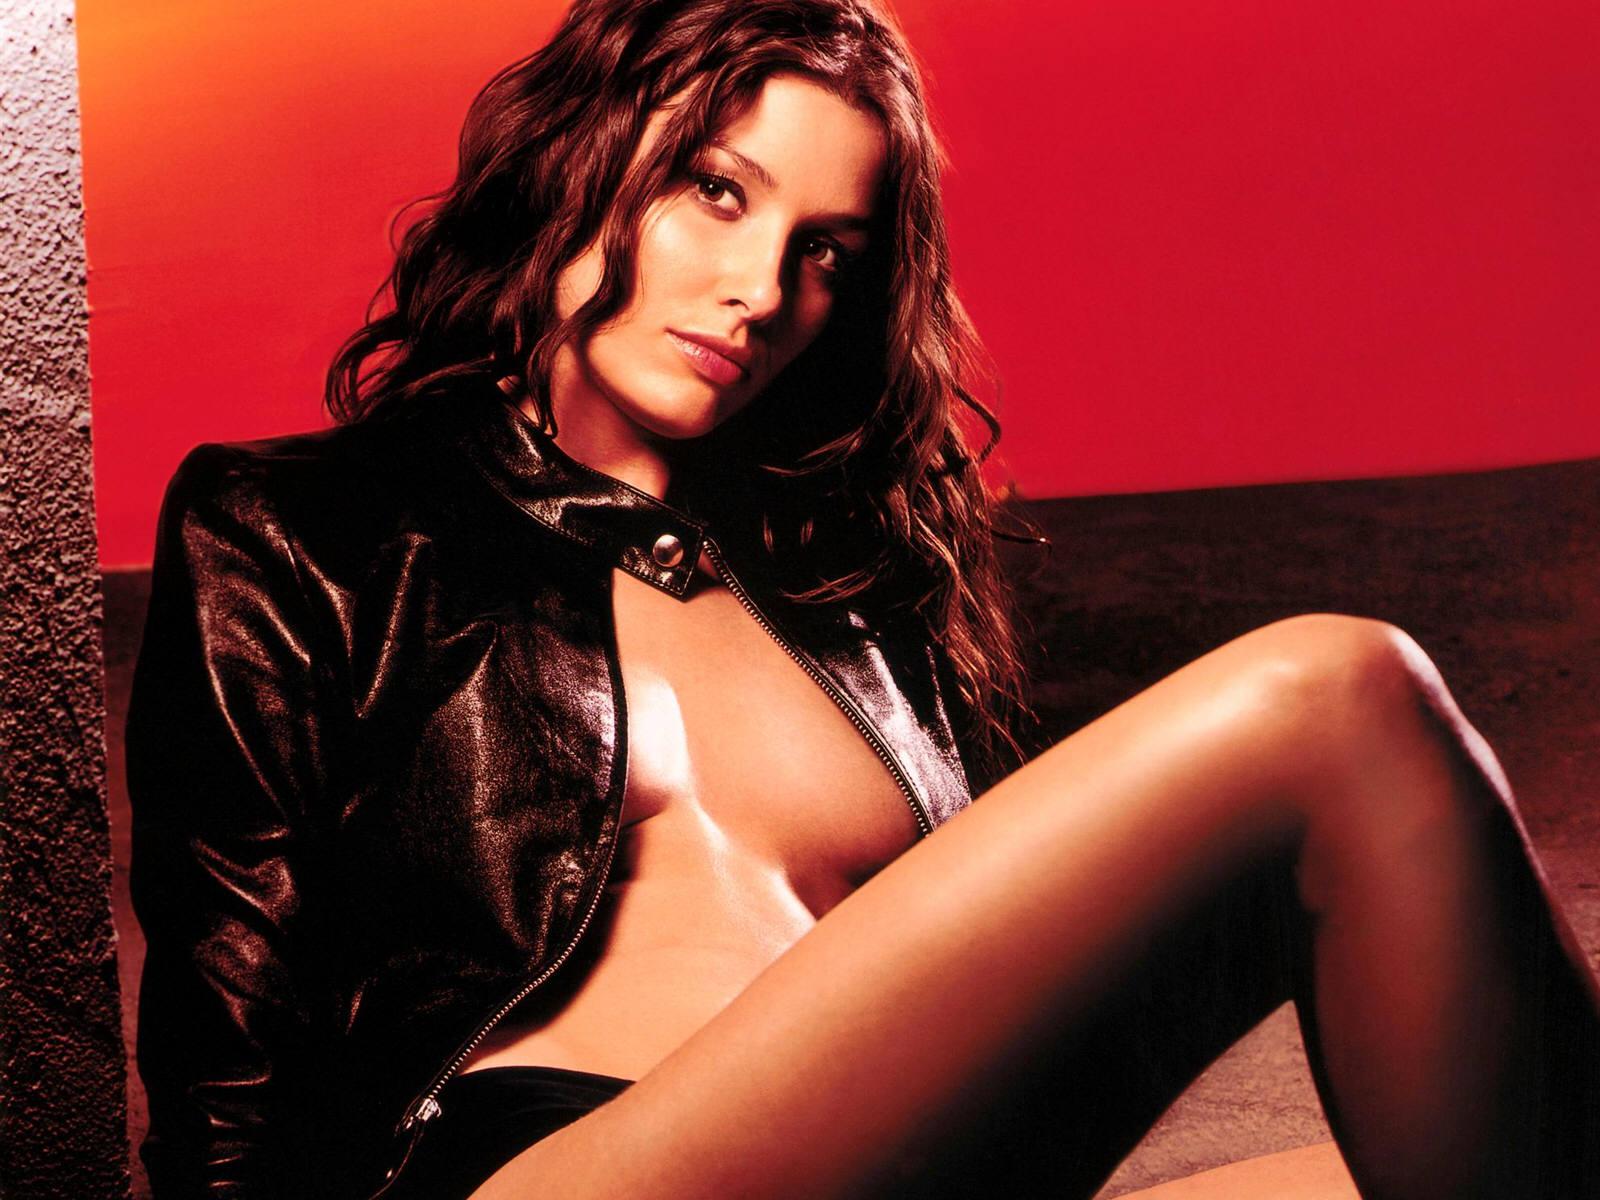 Бриджит Мойнахан фото топлесс Bridget Moynahan photo topless